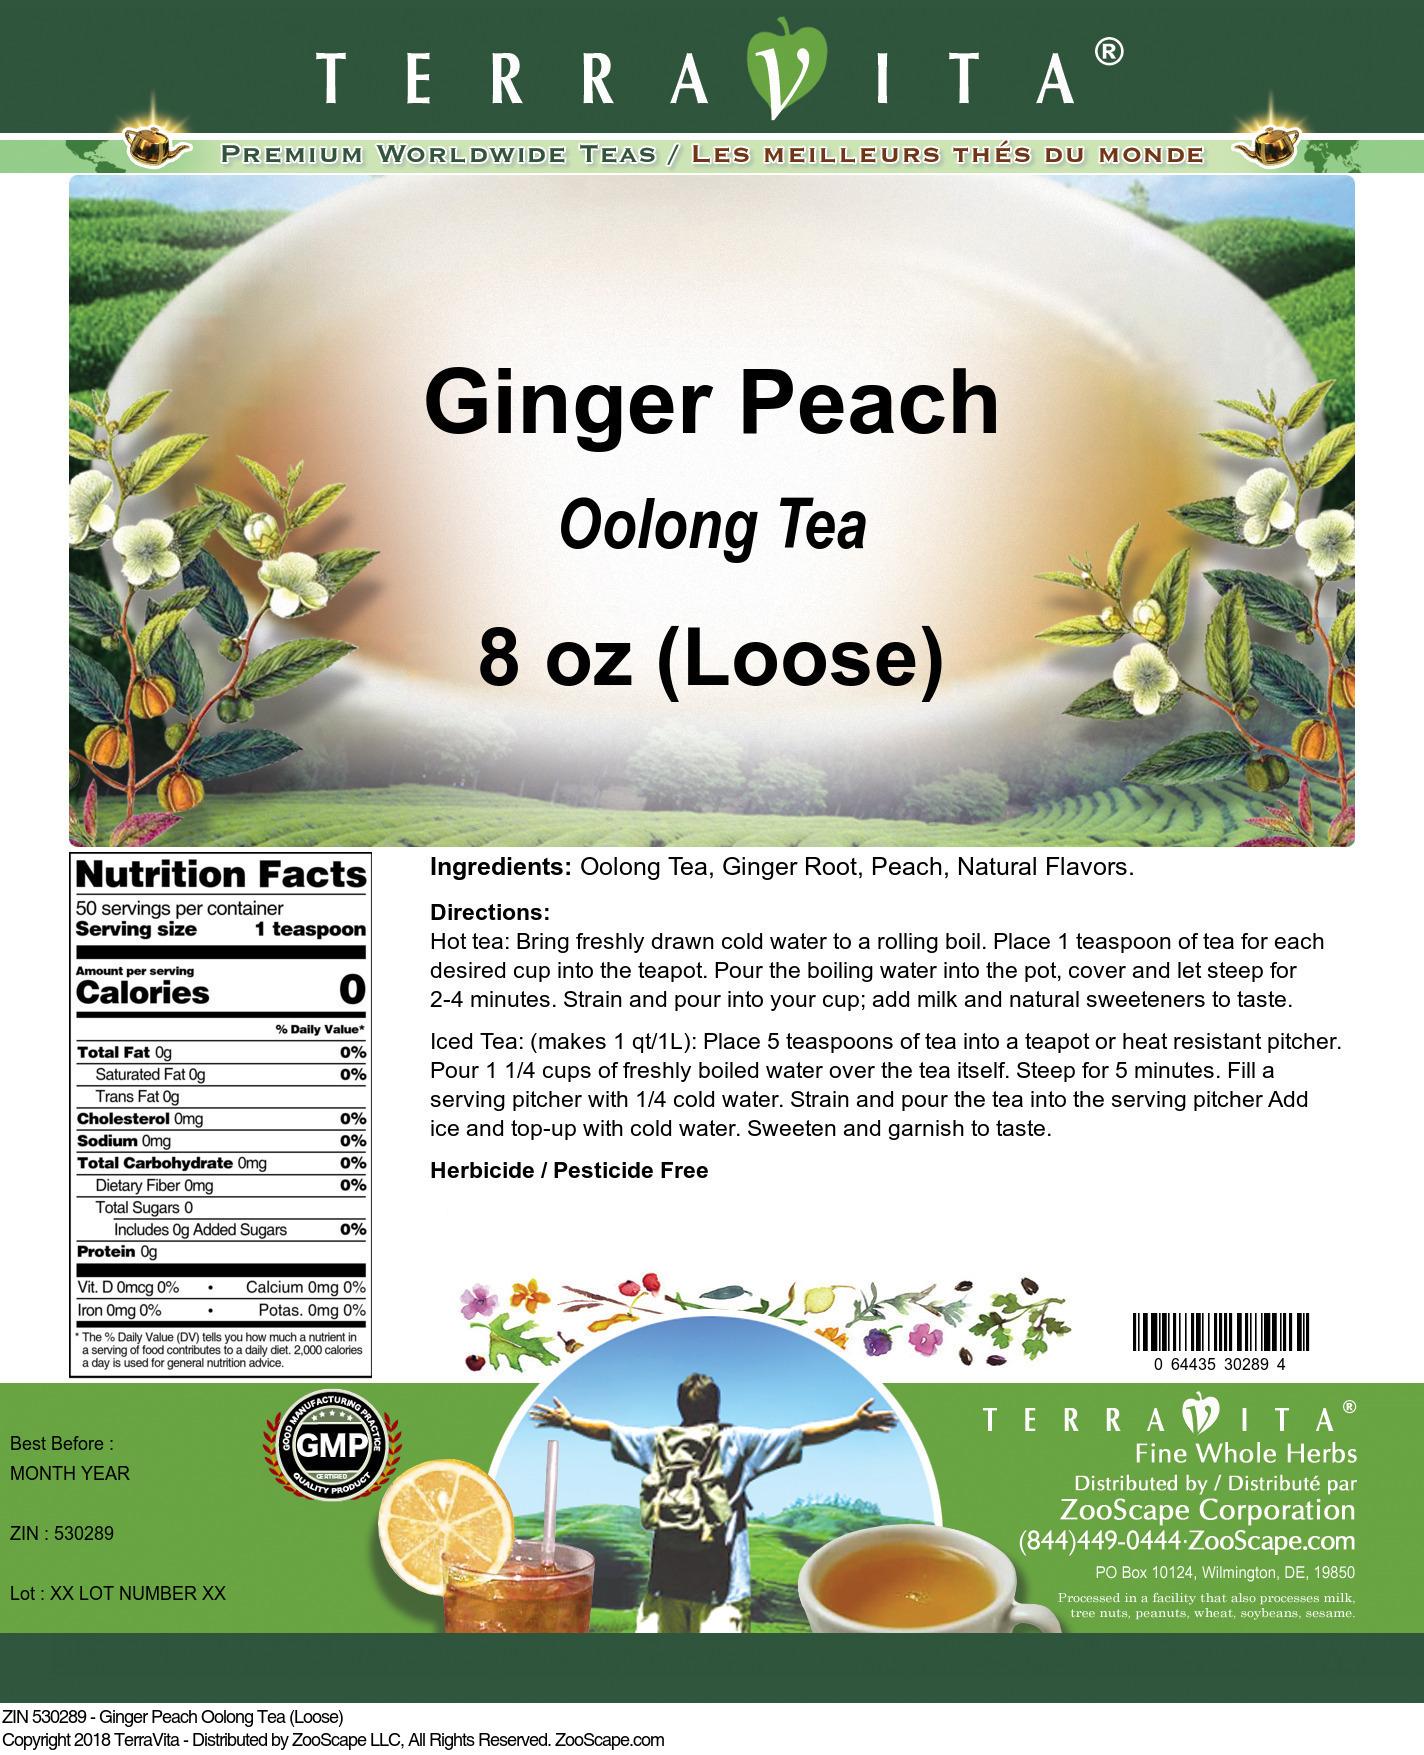 Ginger Peach Oolong Tea